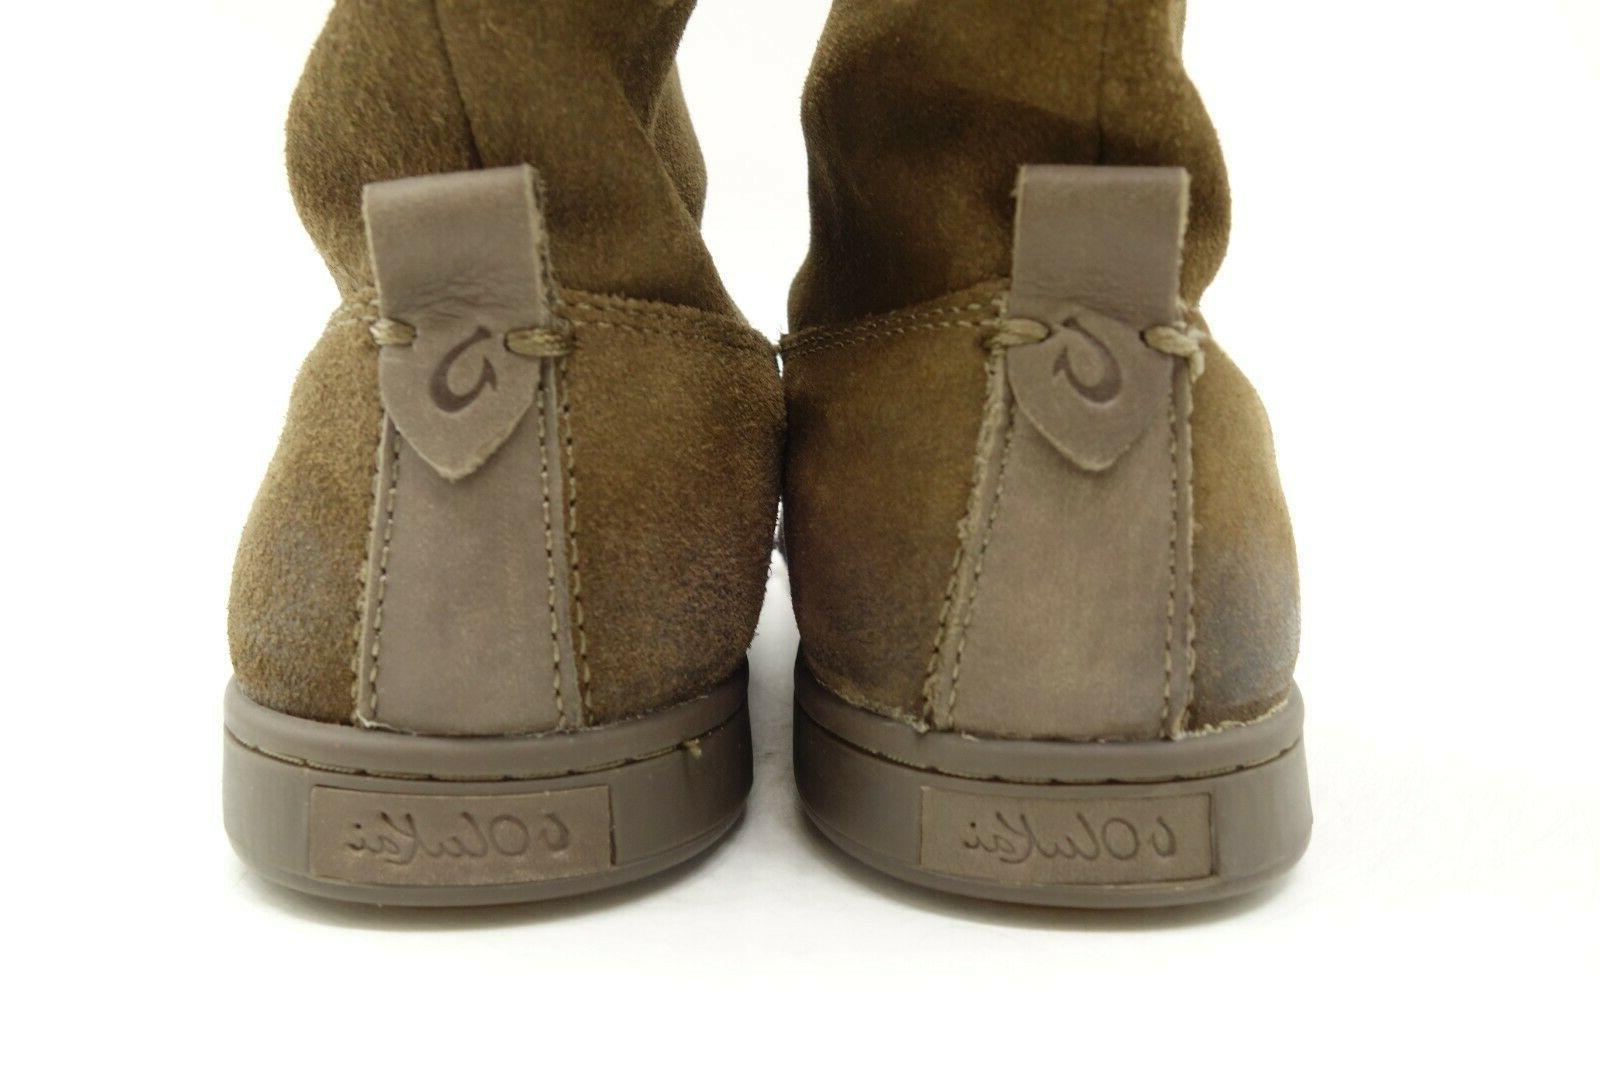 Olukai Moe Tassel Bow Leather Pull On Ankle Boots Women's 8